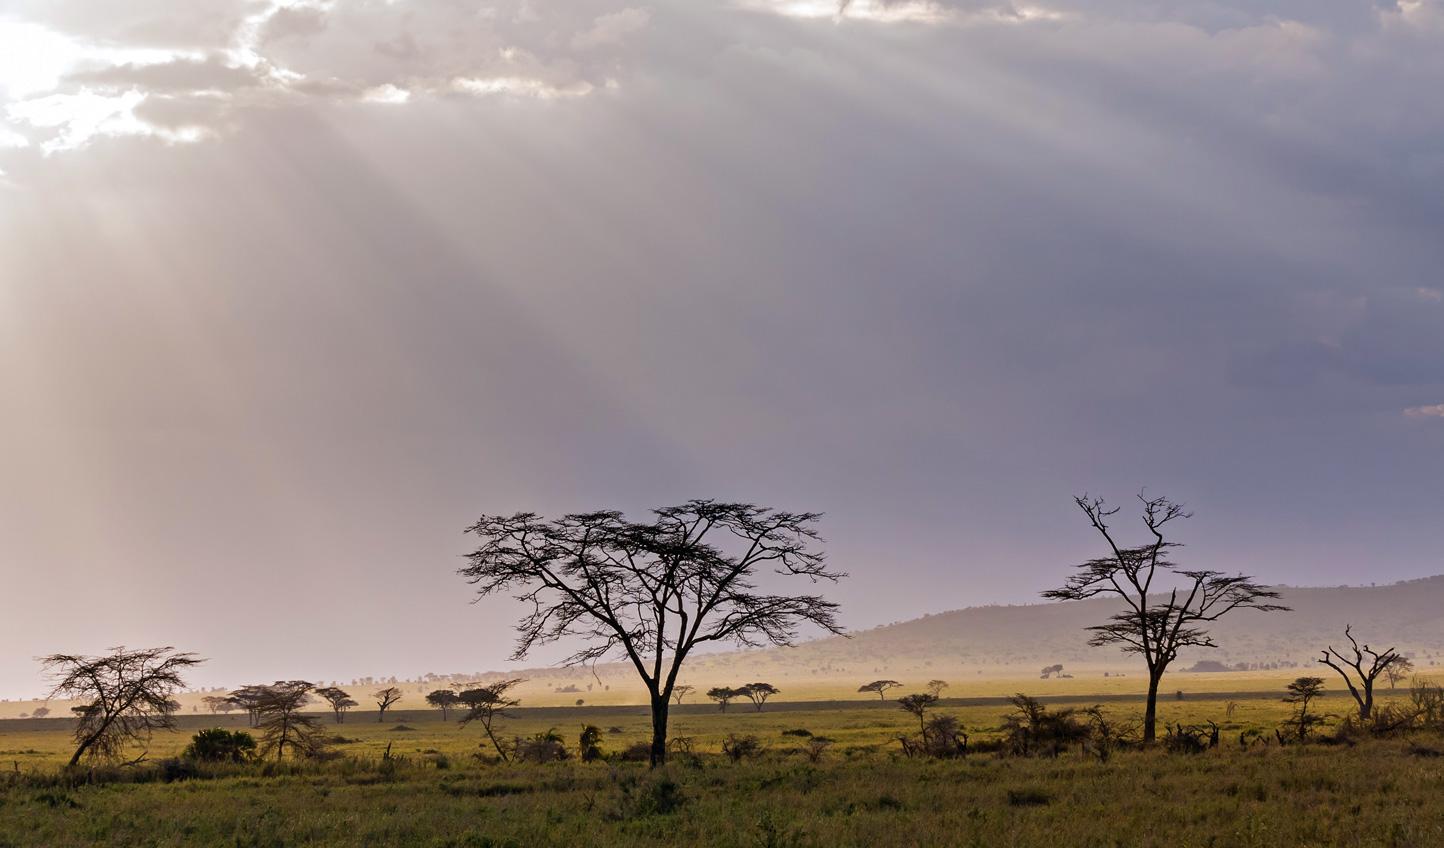 Explore the vast, rumbling plains of the Serengeti